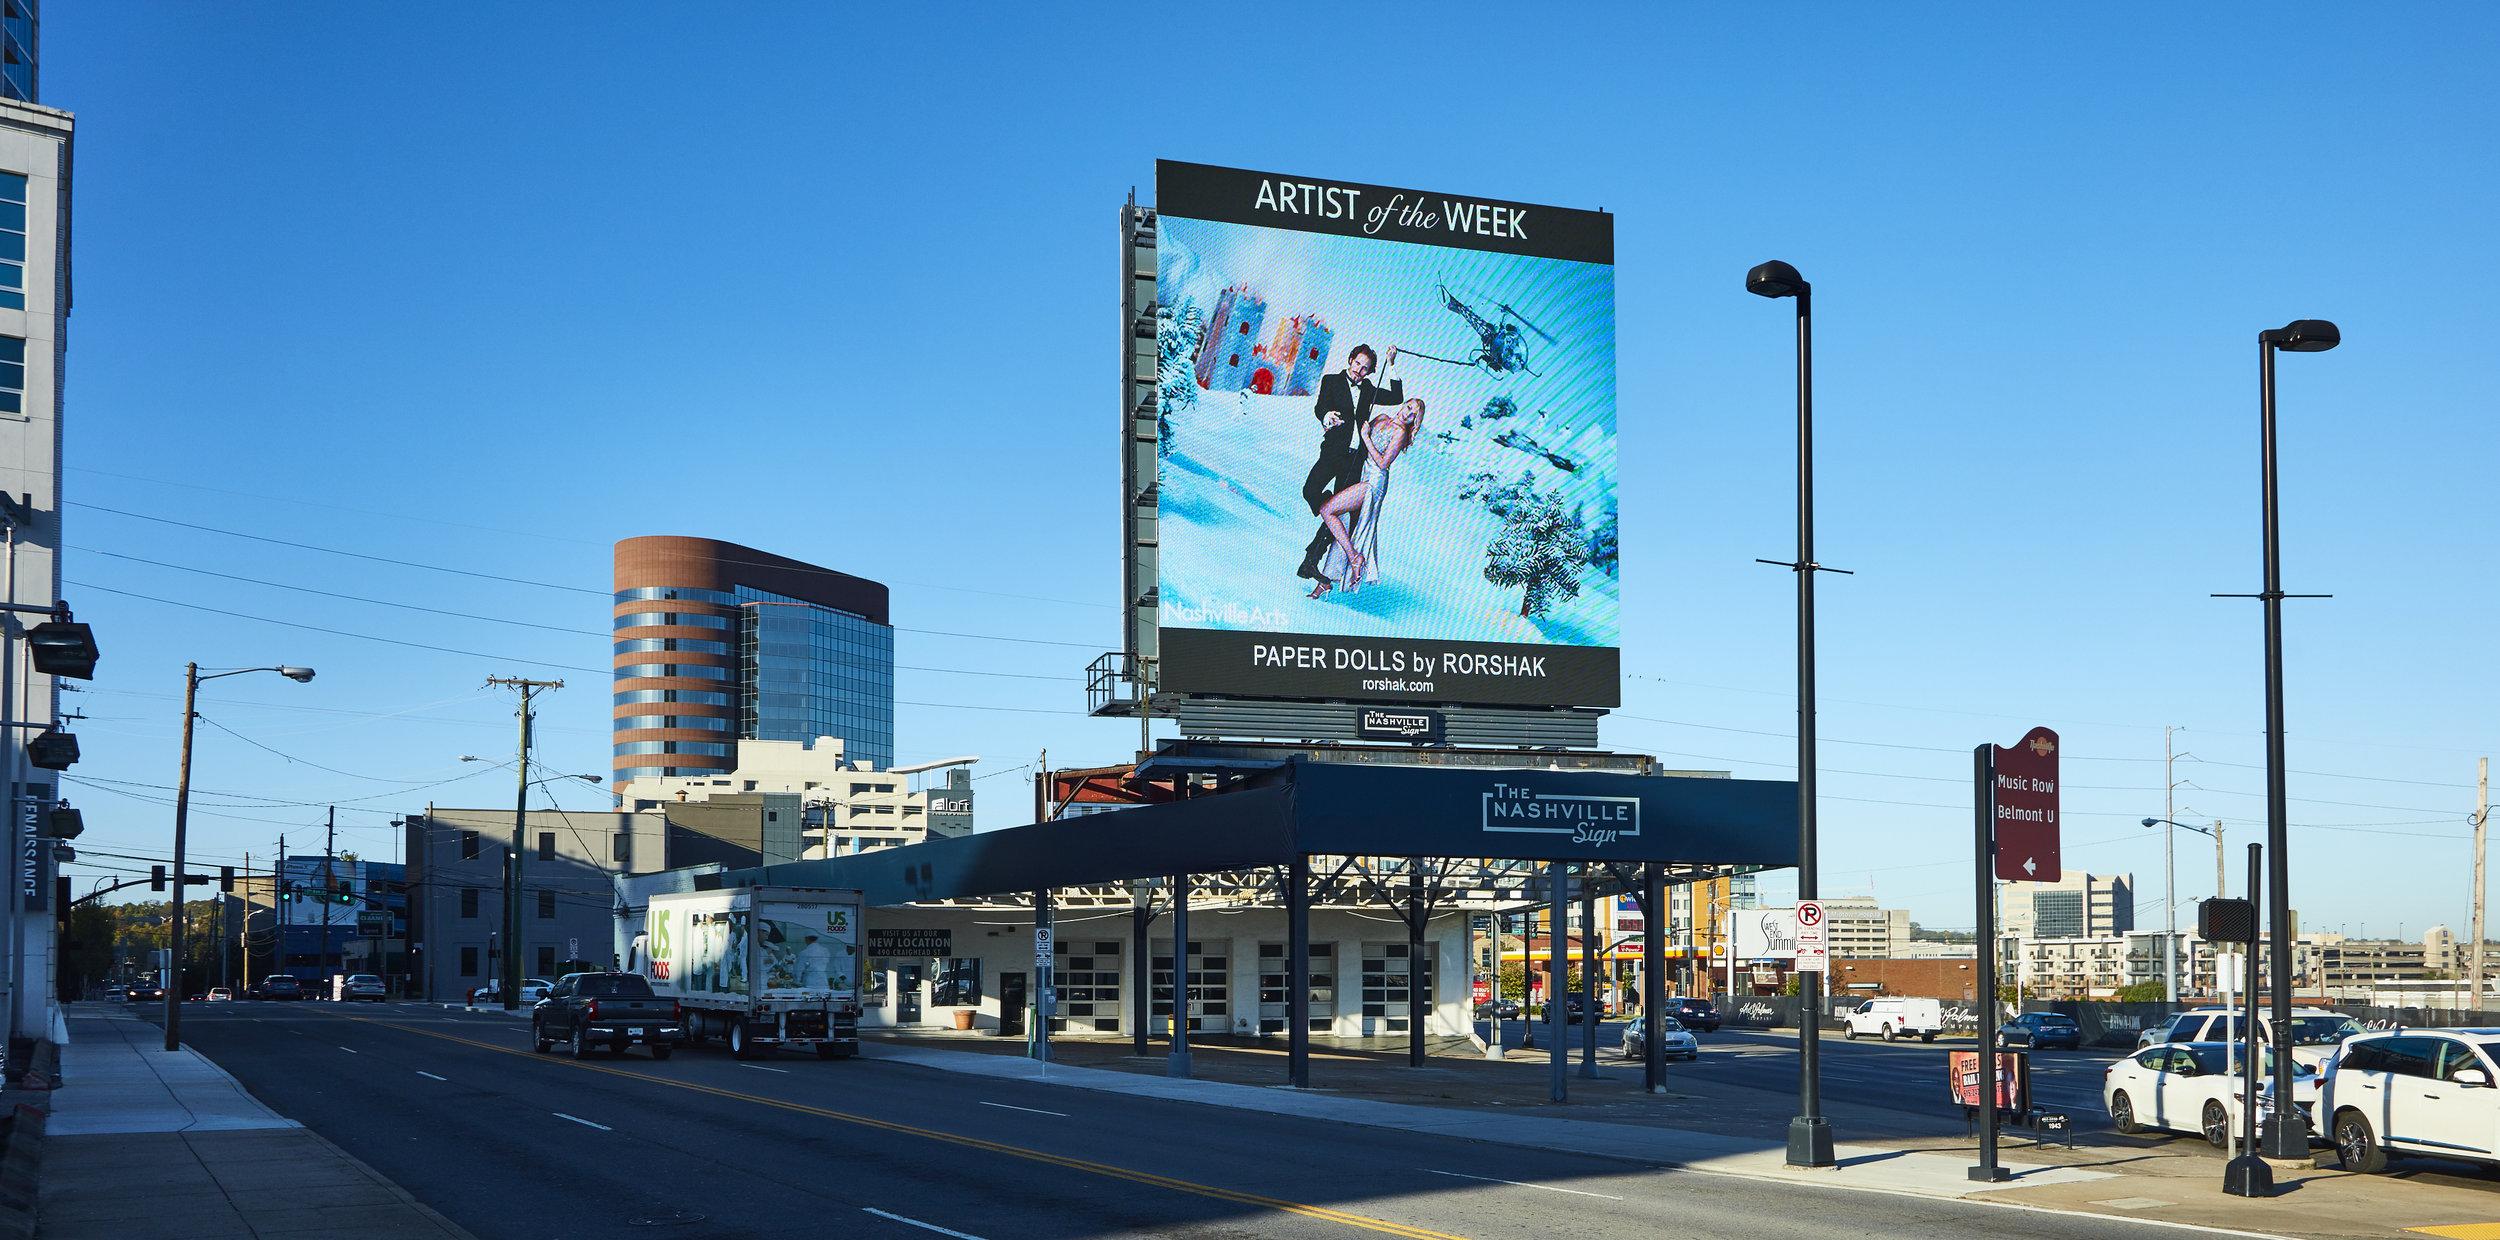 rorshak_billboard 12.jpg